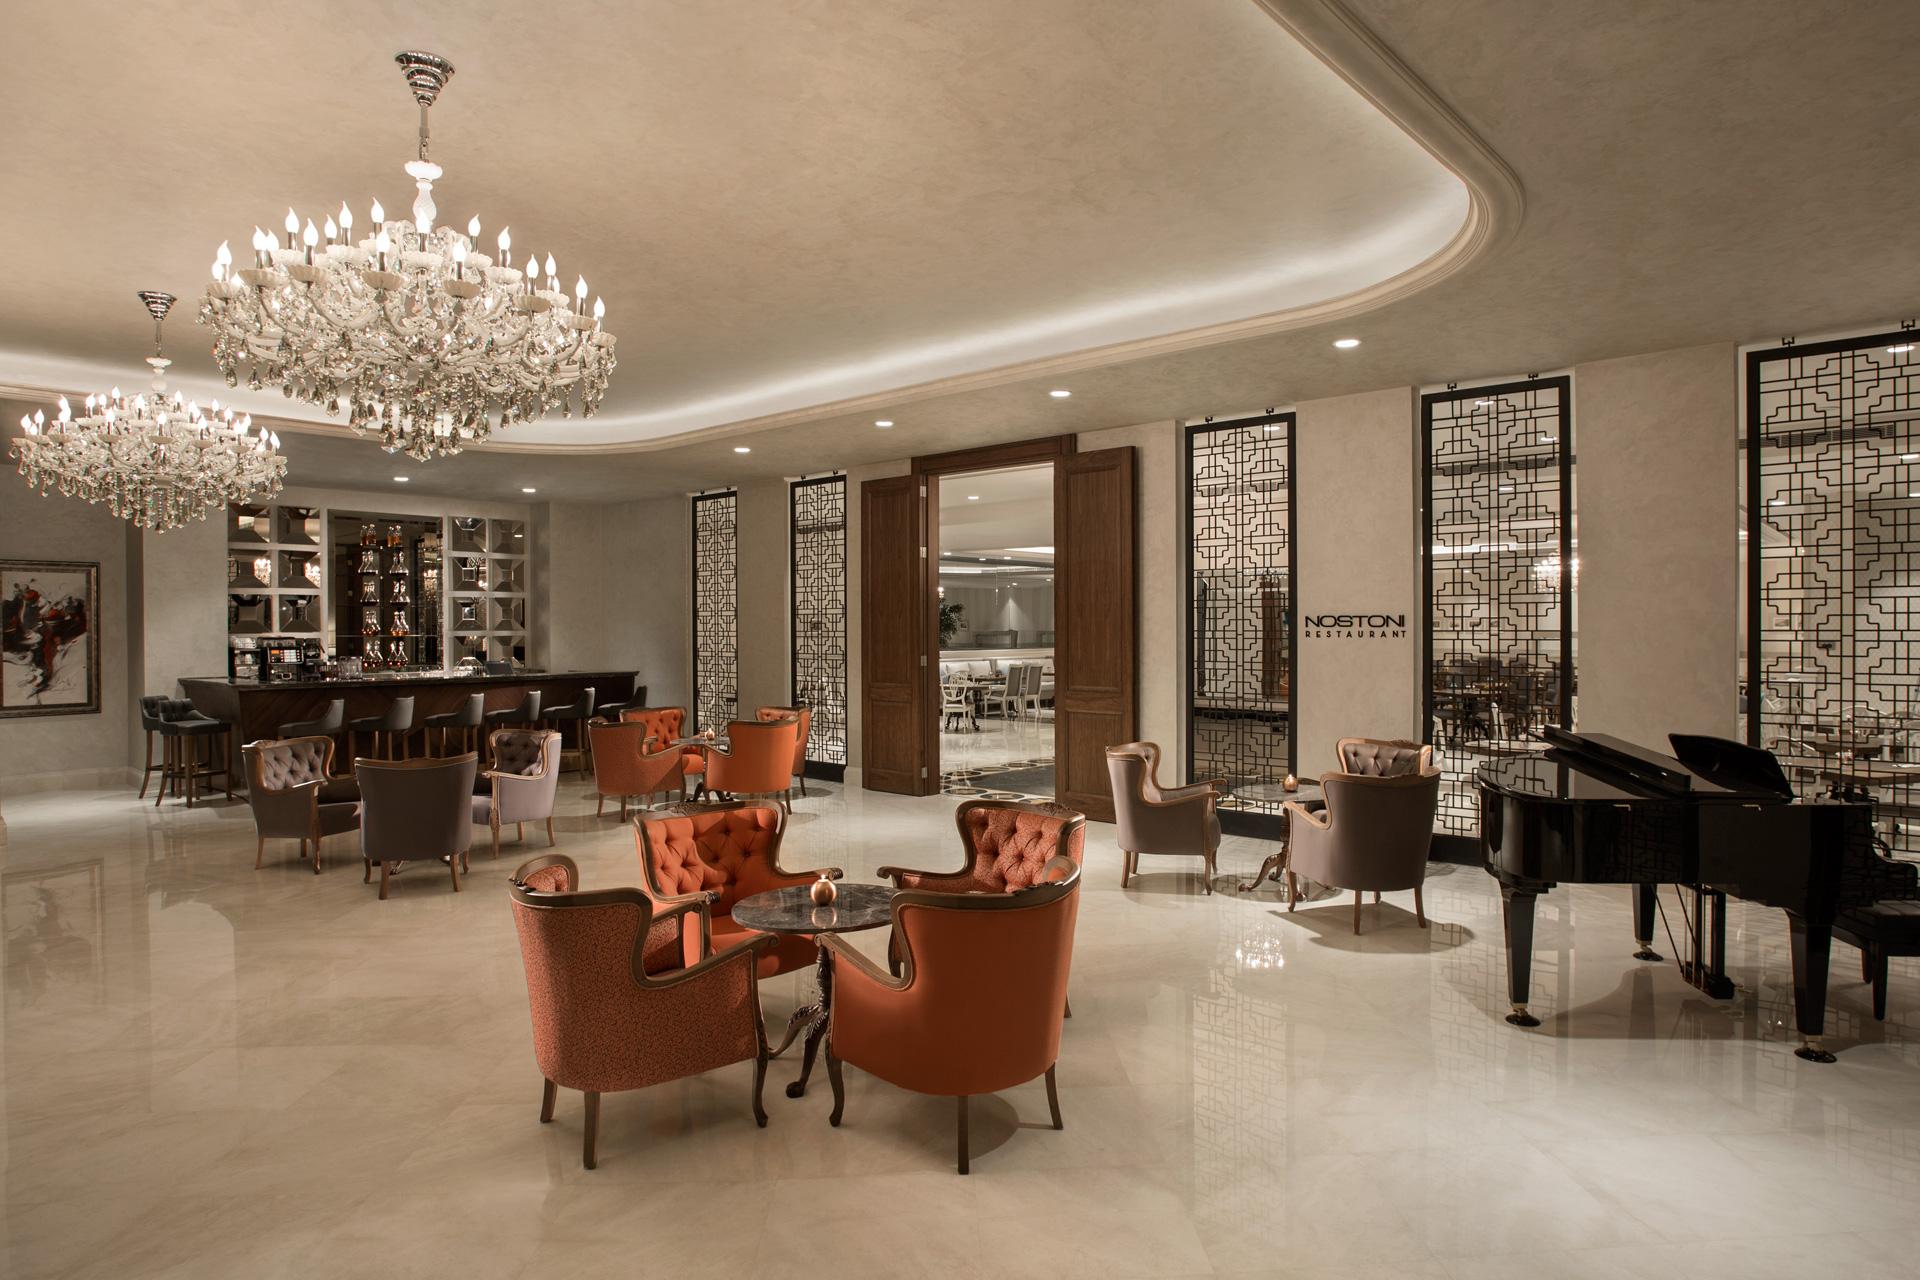 Lazzoni Hotel | Lobby Lounge